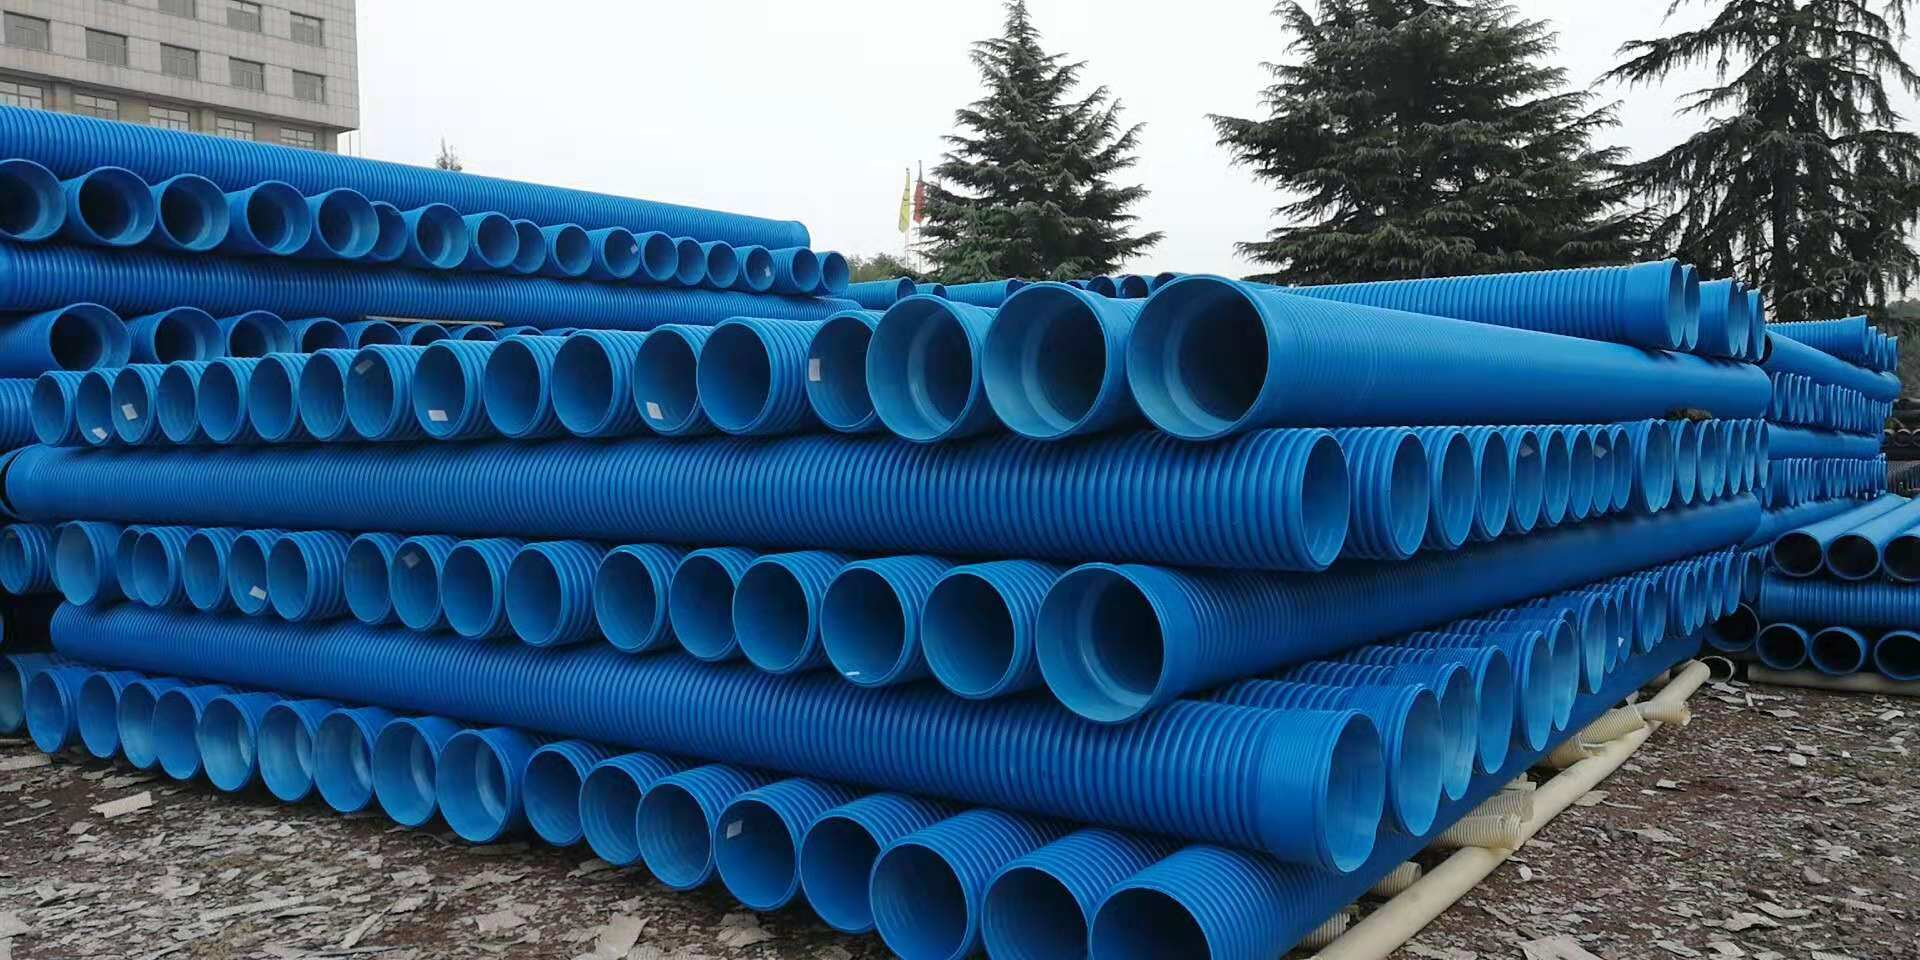 PVC-M增强双壁波纹管相较PVC-U管材的区别